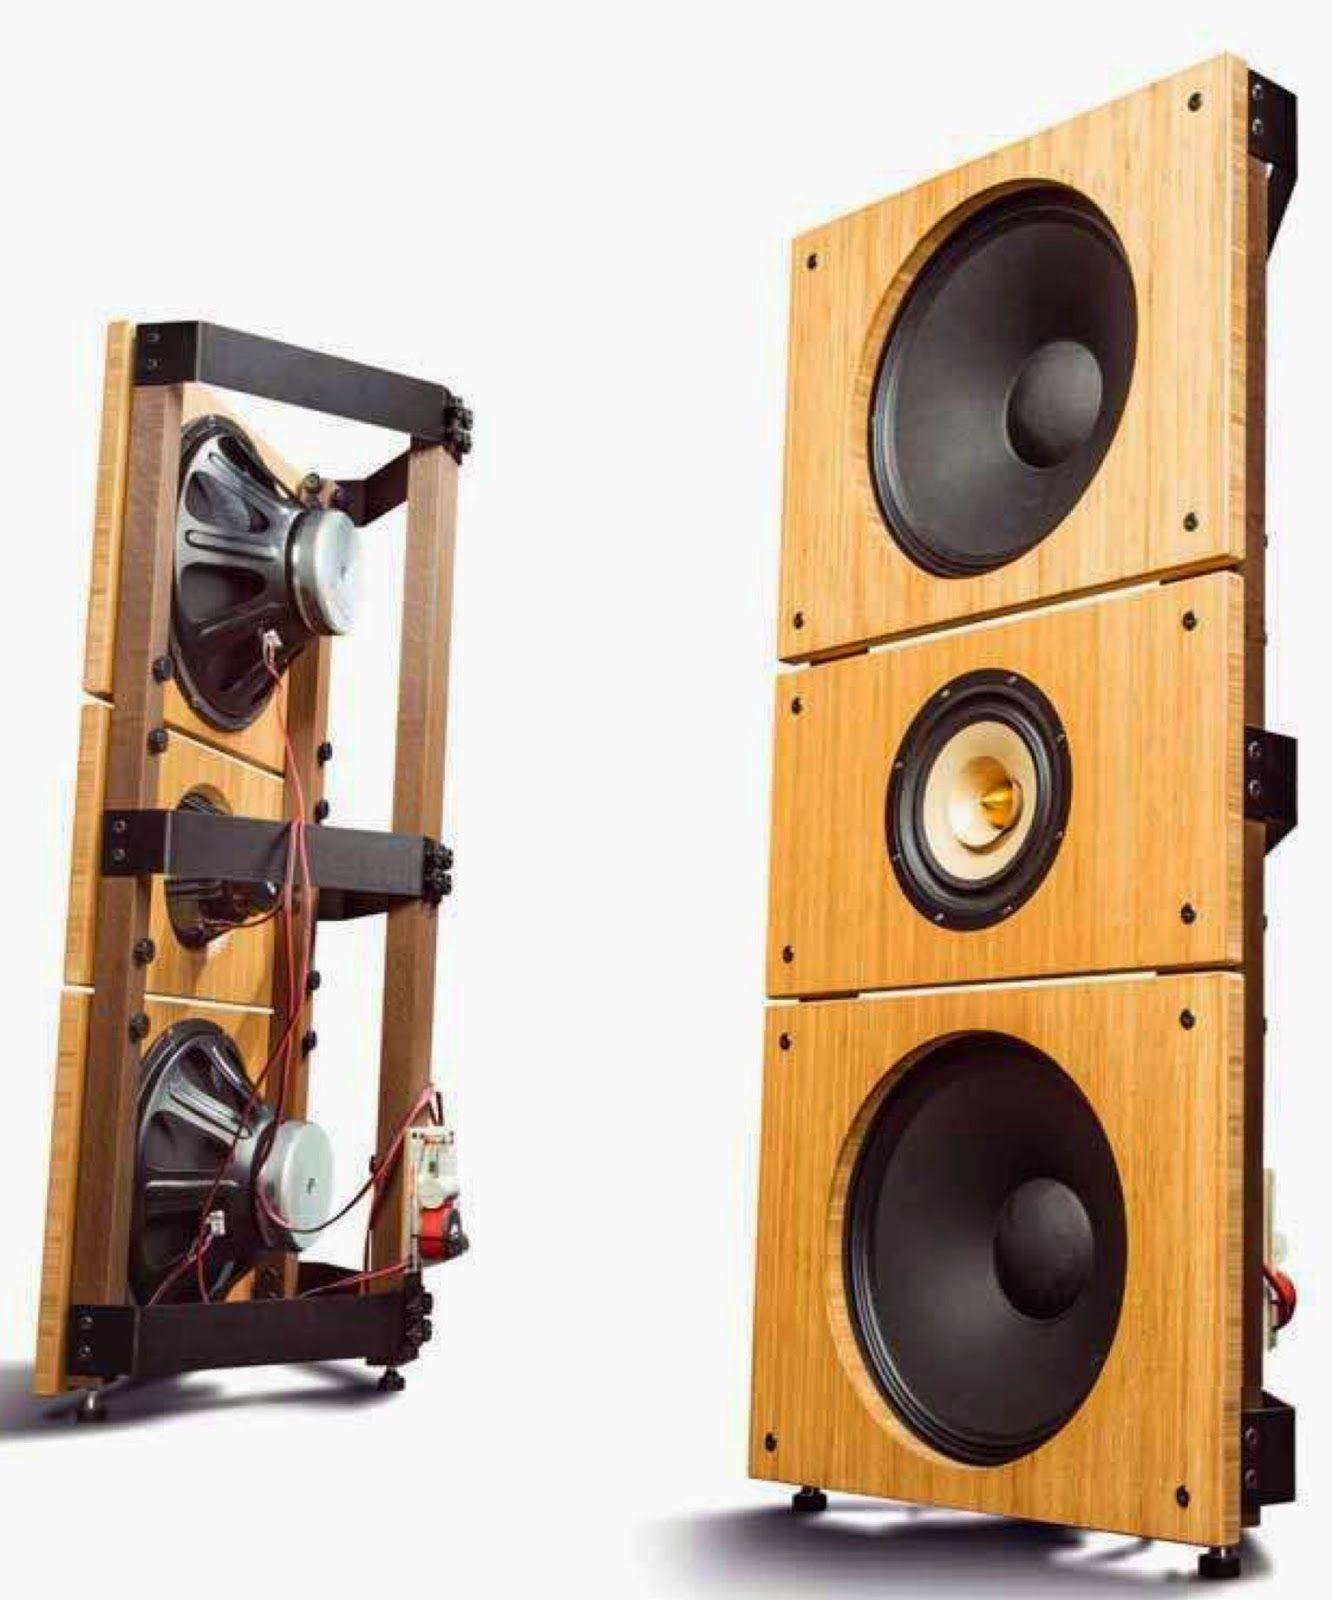 Lautsprecher Diy  Röhrenverstärker Röhren Hochwirkungsgradlautsprecher